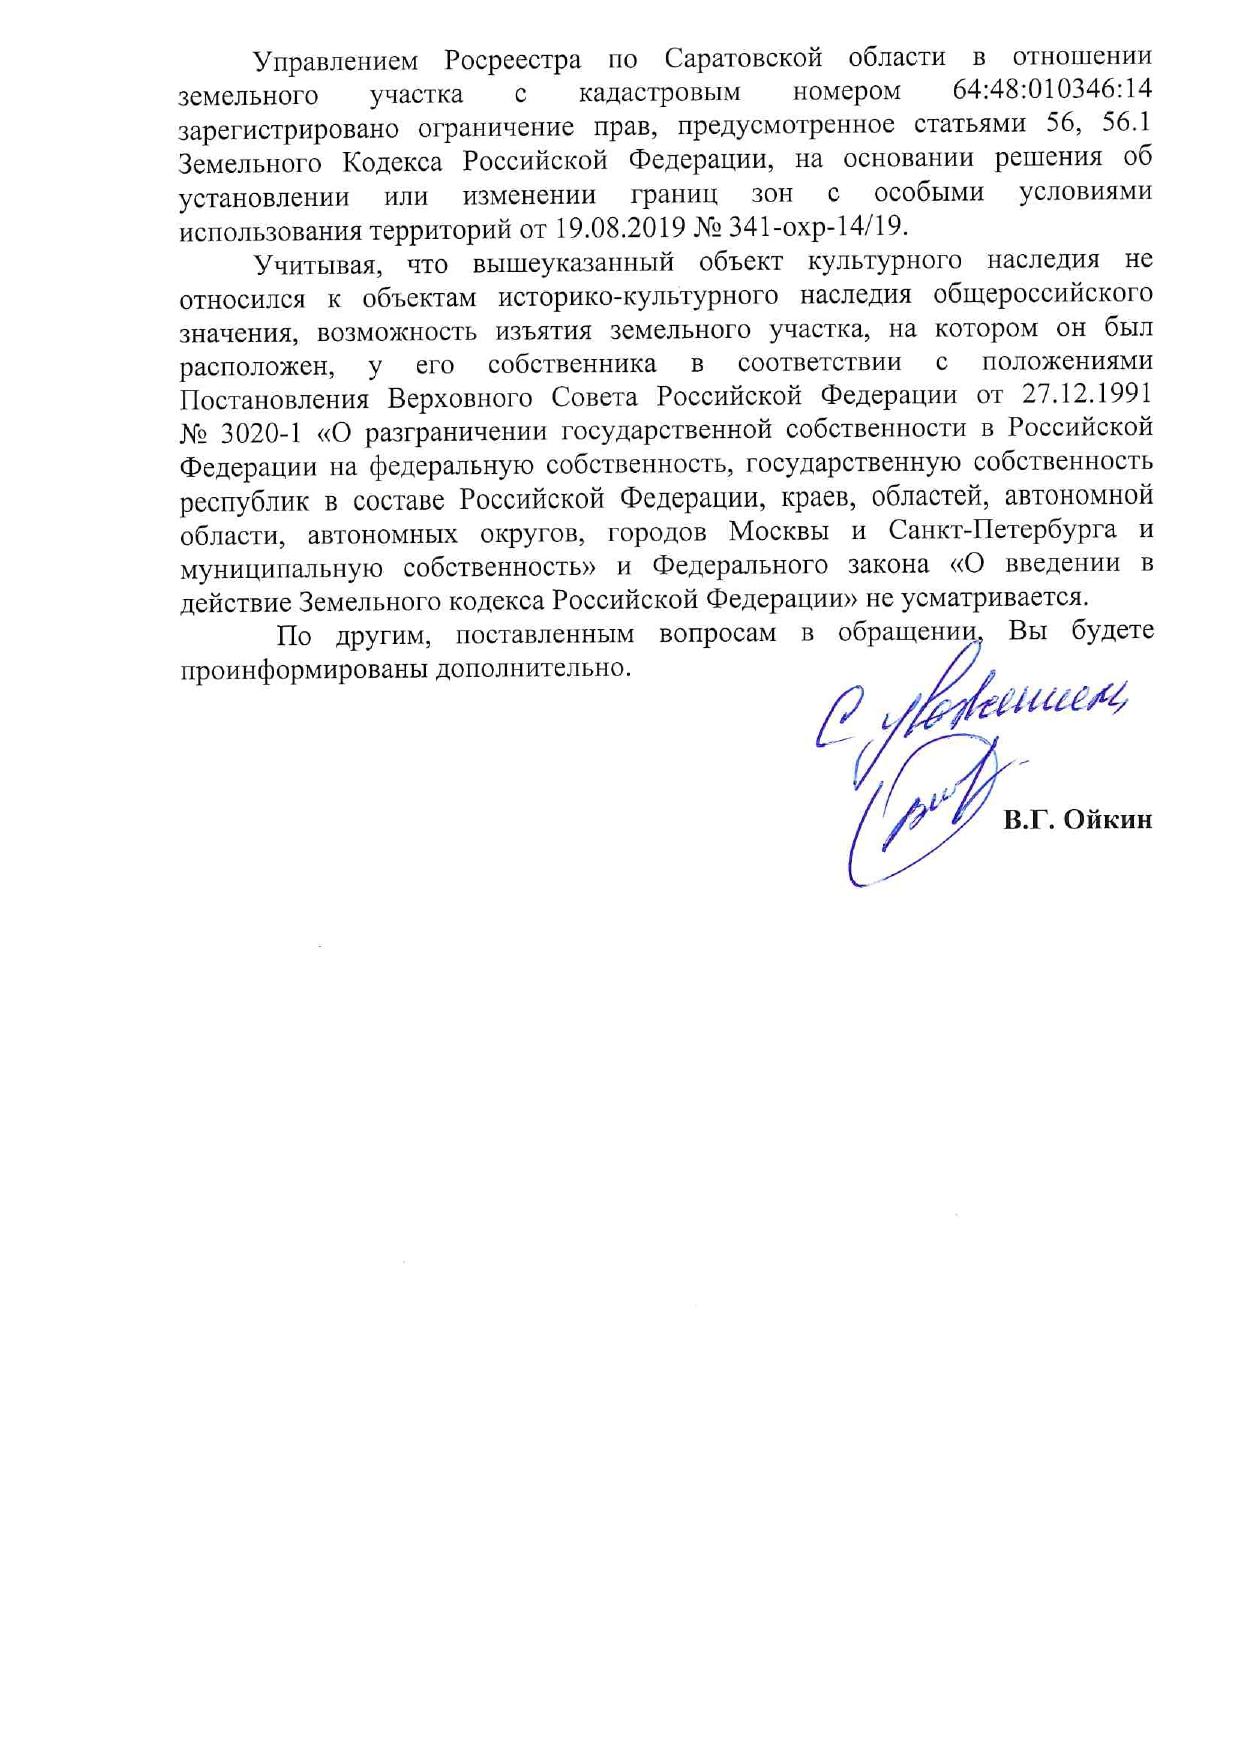 Бернадскому А.Ф. 3-12-34-72 от 17.01.2020_page-0002